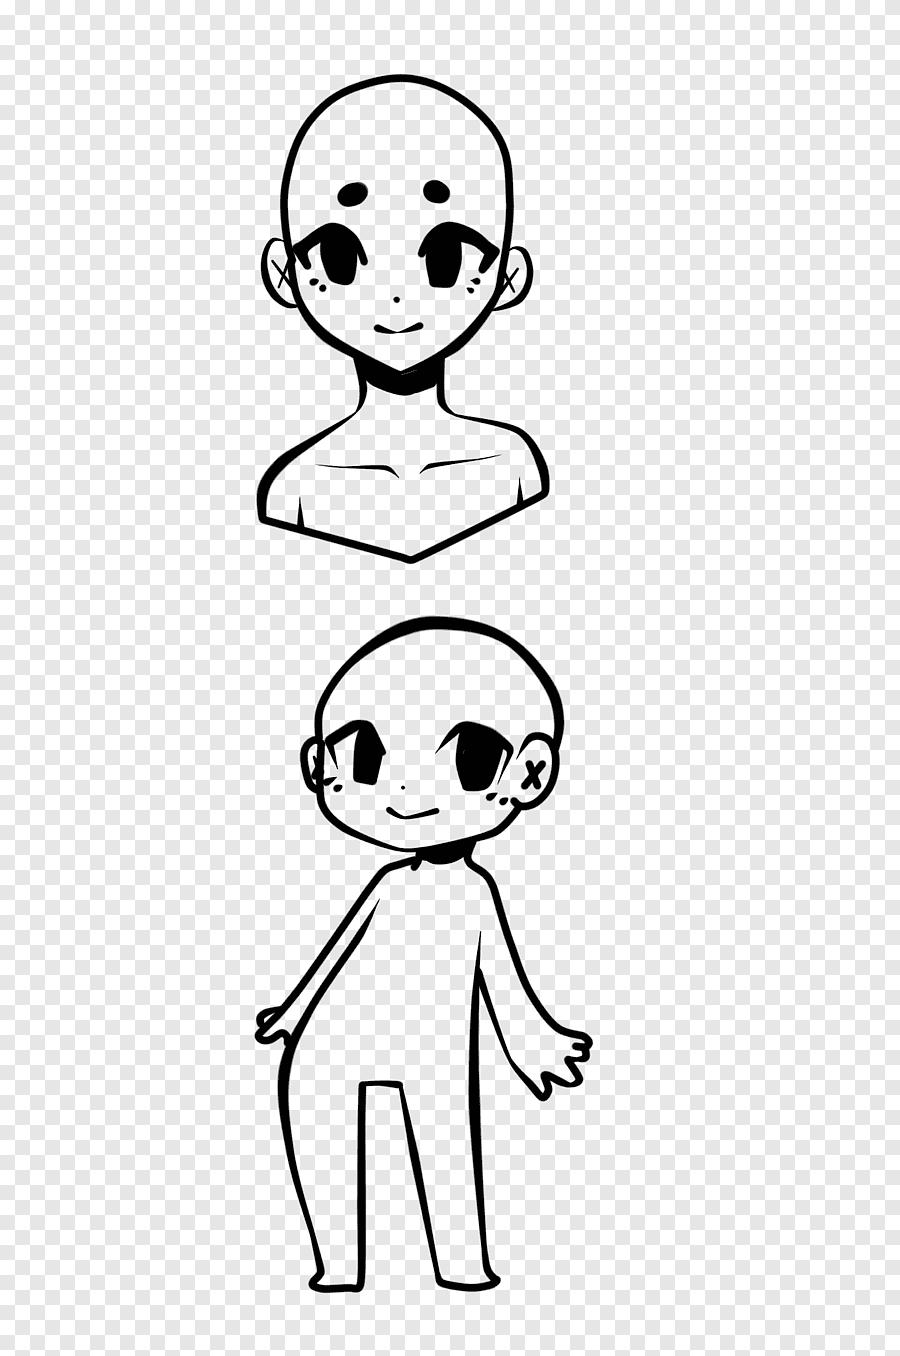 Chibi Base Boy : chibi, Chibi, Base,, Boy's, Profile, Cartoon, Character, Illustration,, PNGEgg